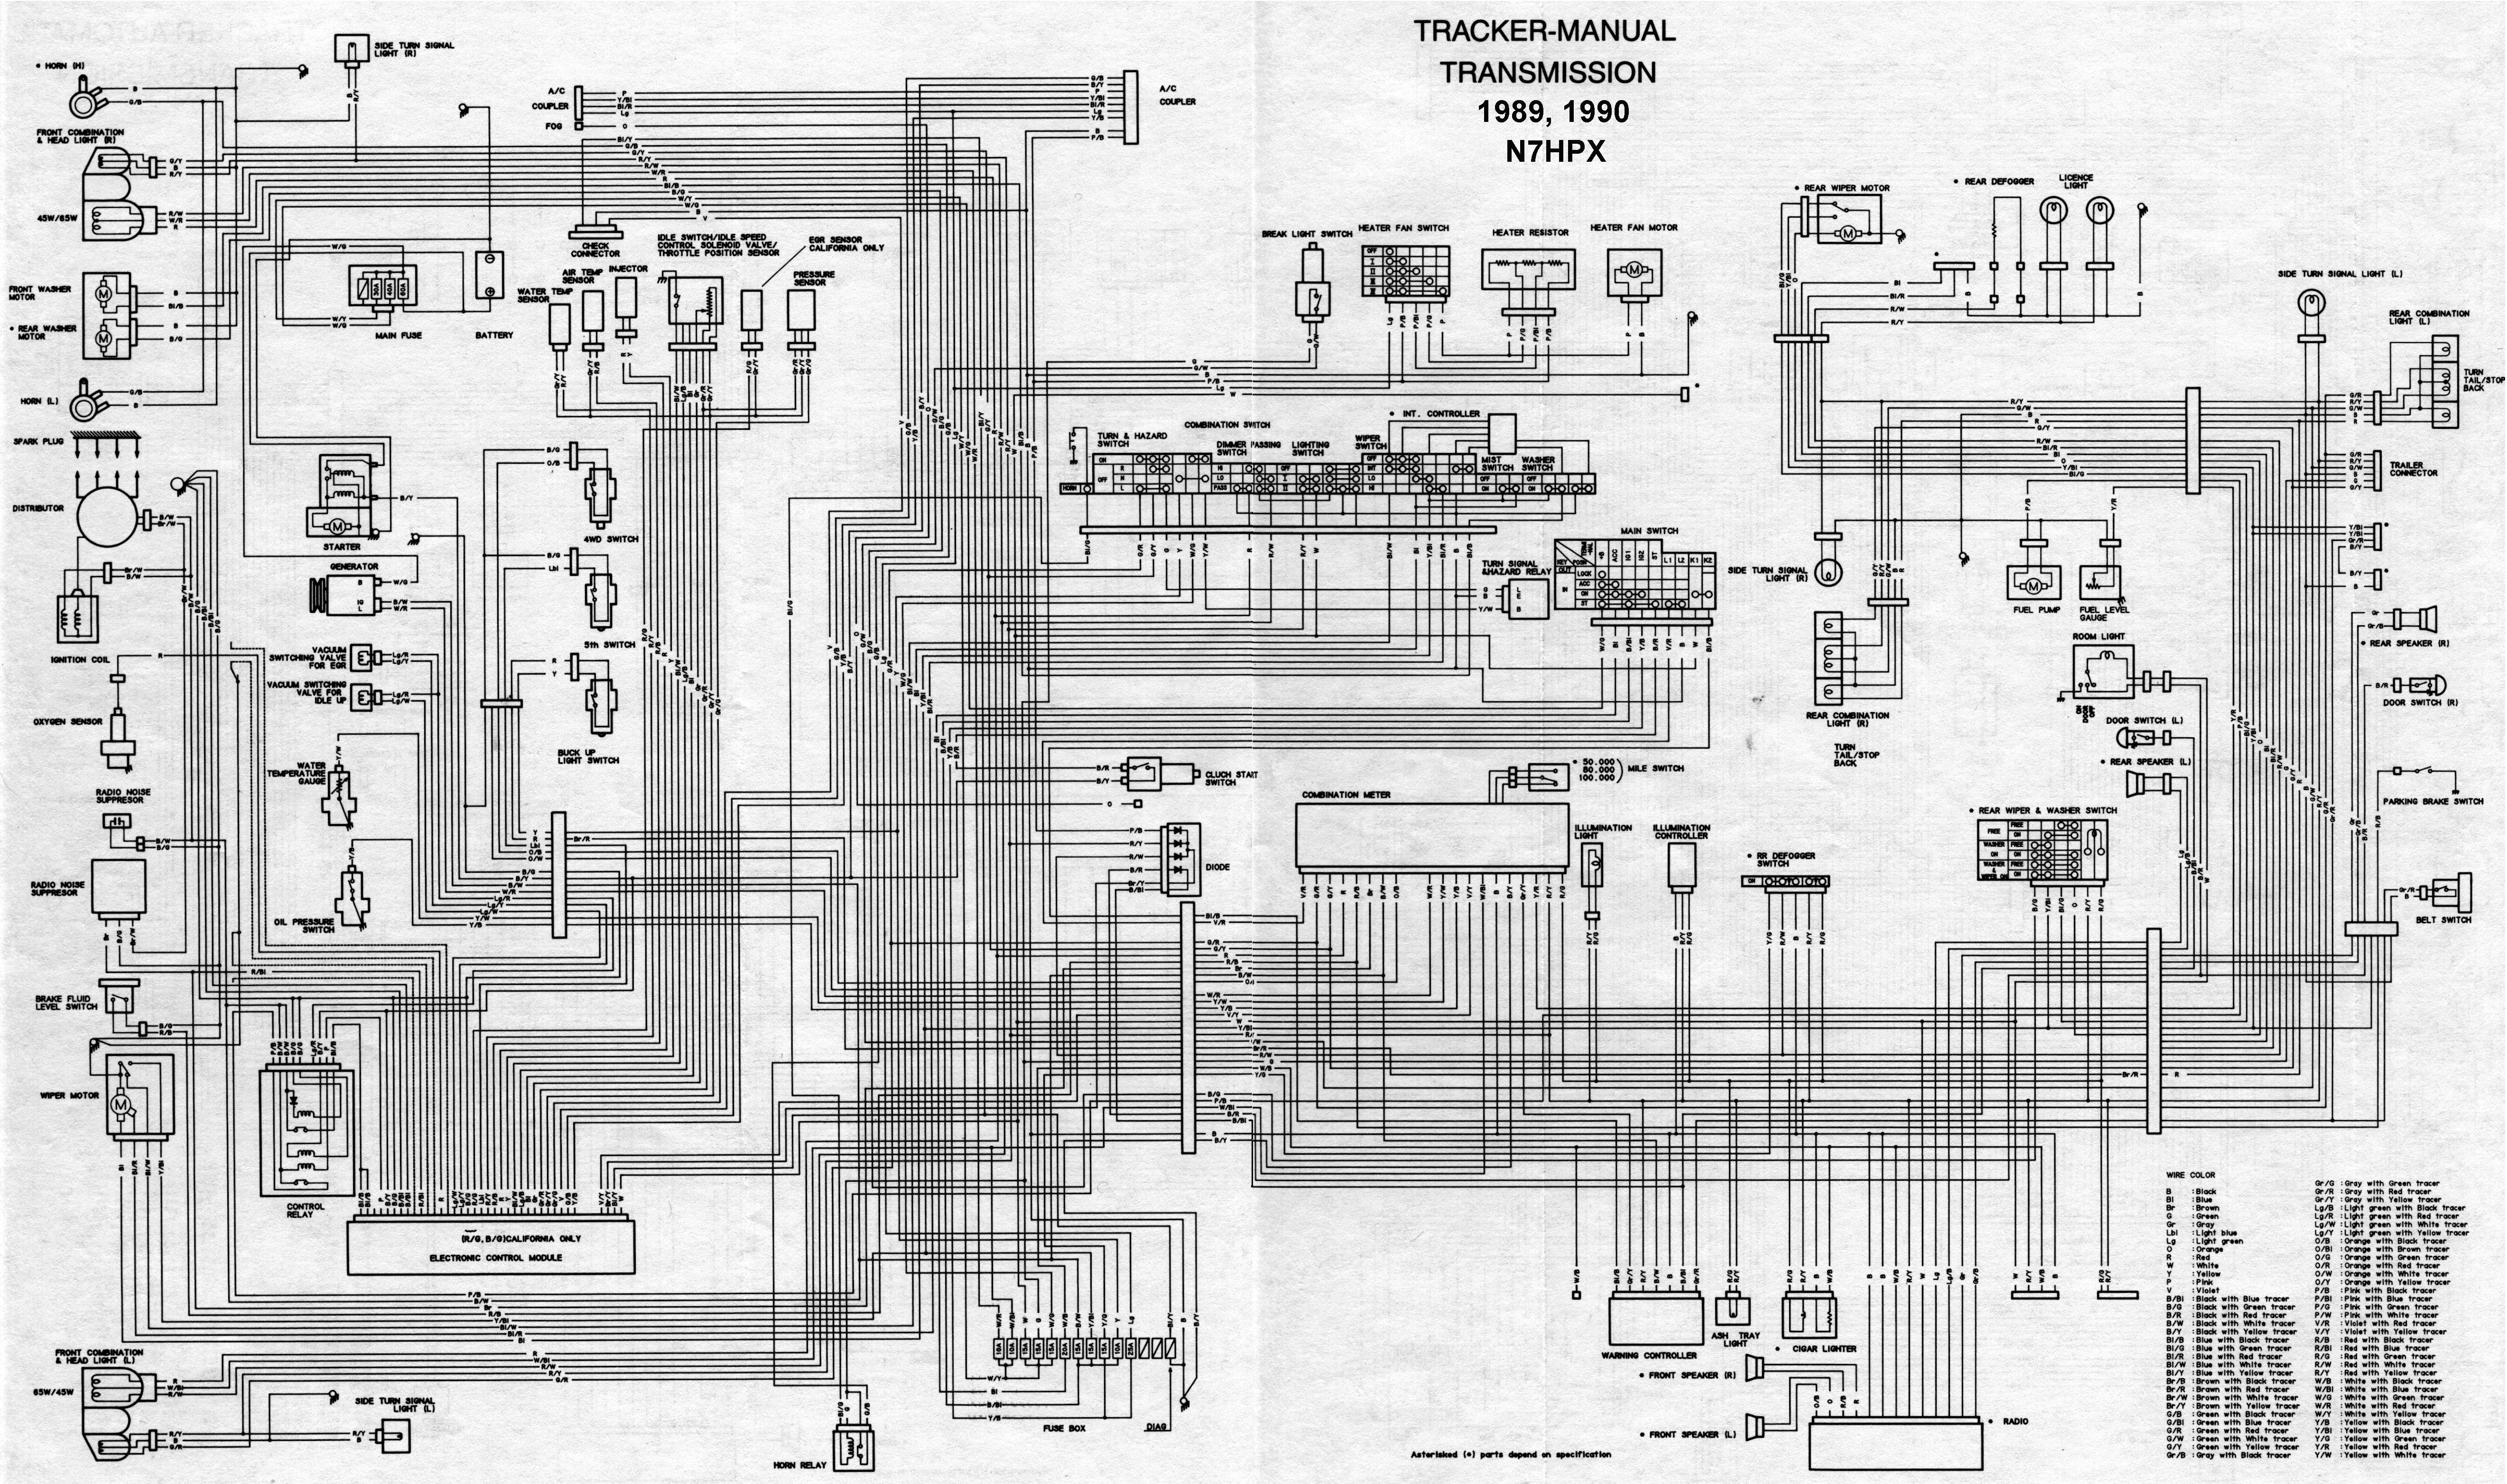 Suzuki Samurai A C Wiring Diagram Library Kfx 80 Sidekick Wiringdiagram